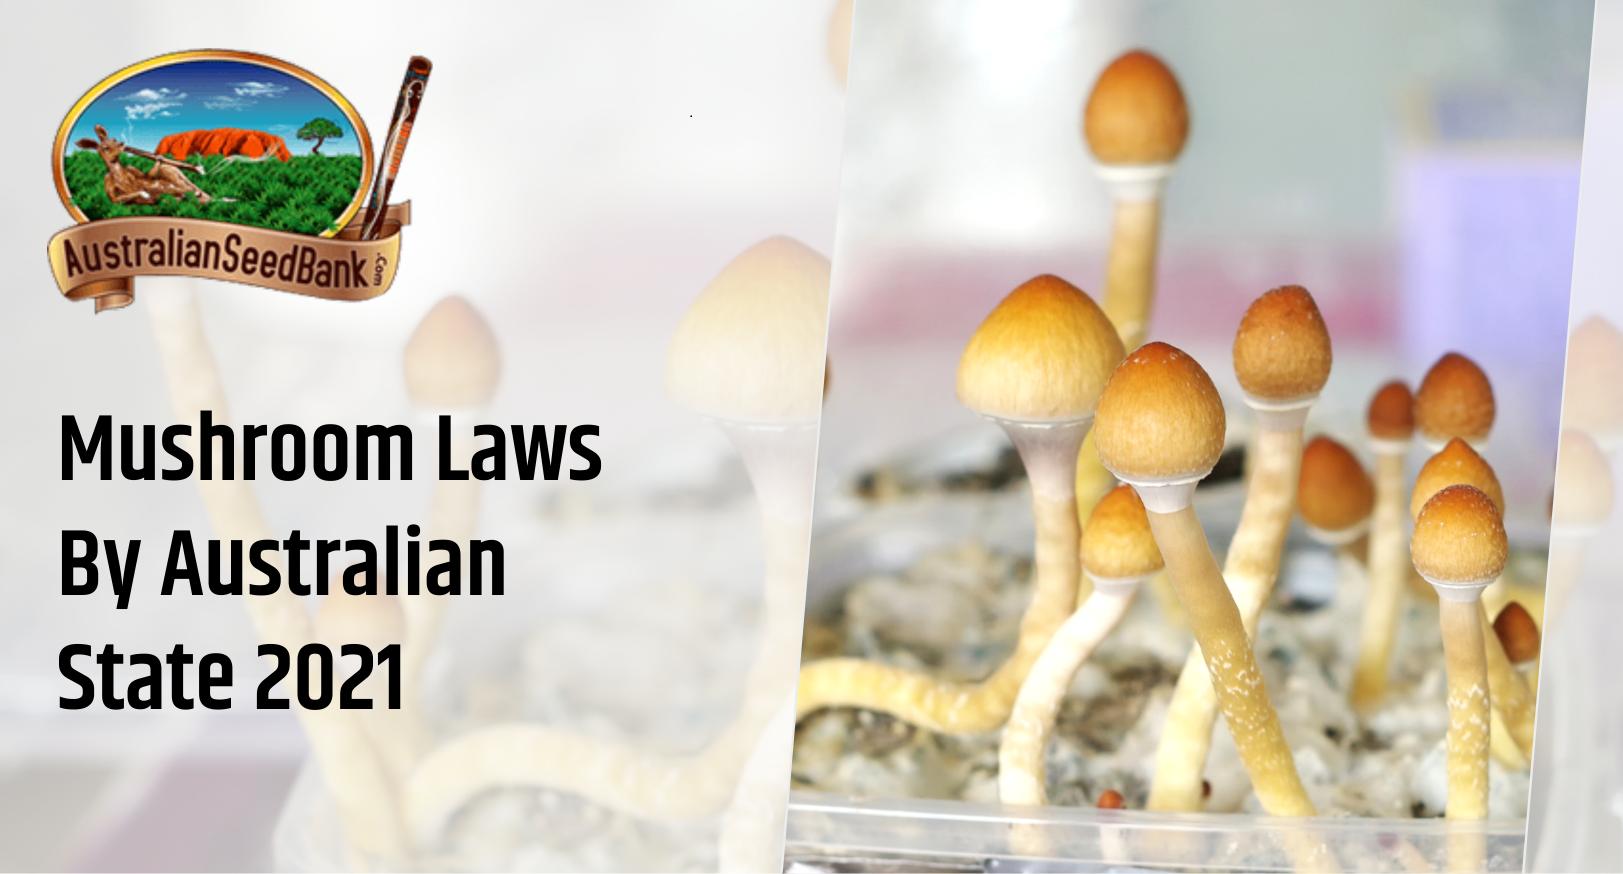 Mushroom laws by Australian State